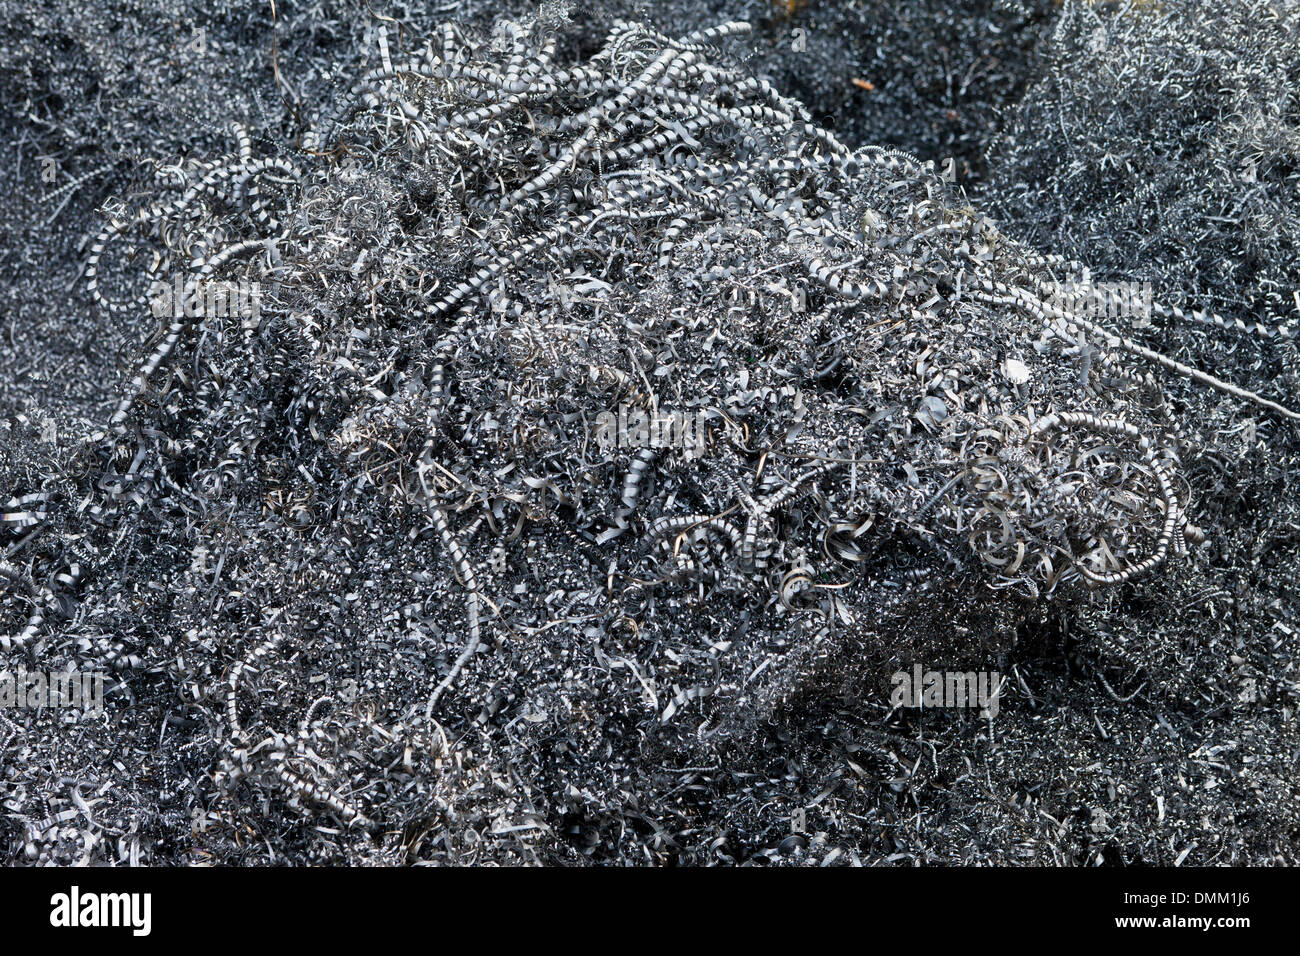 Metal shavings in pile - Stock Image